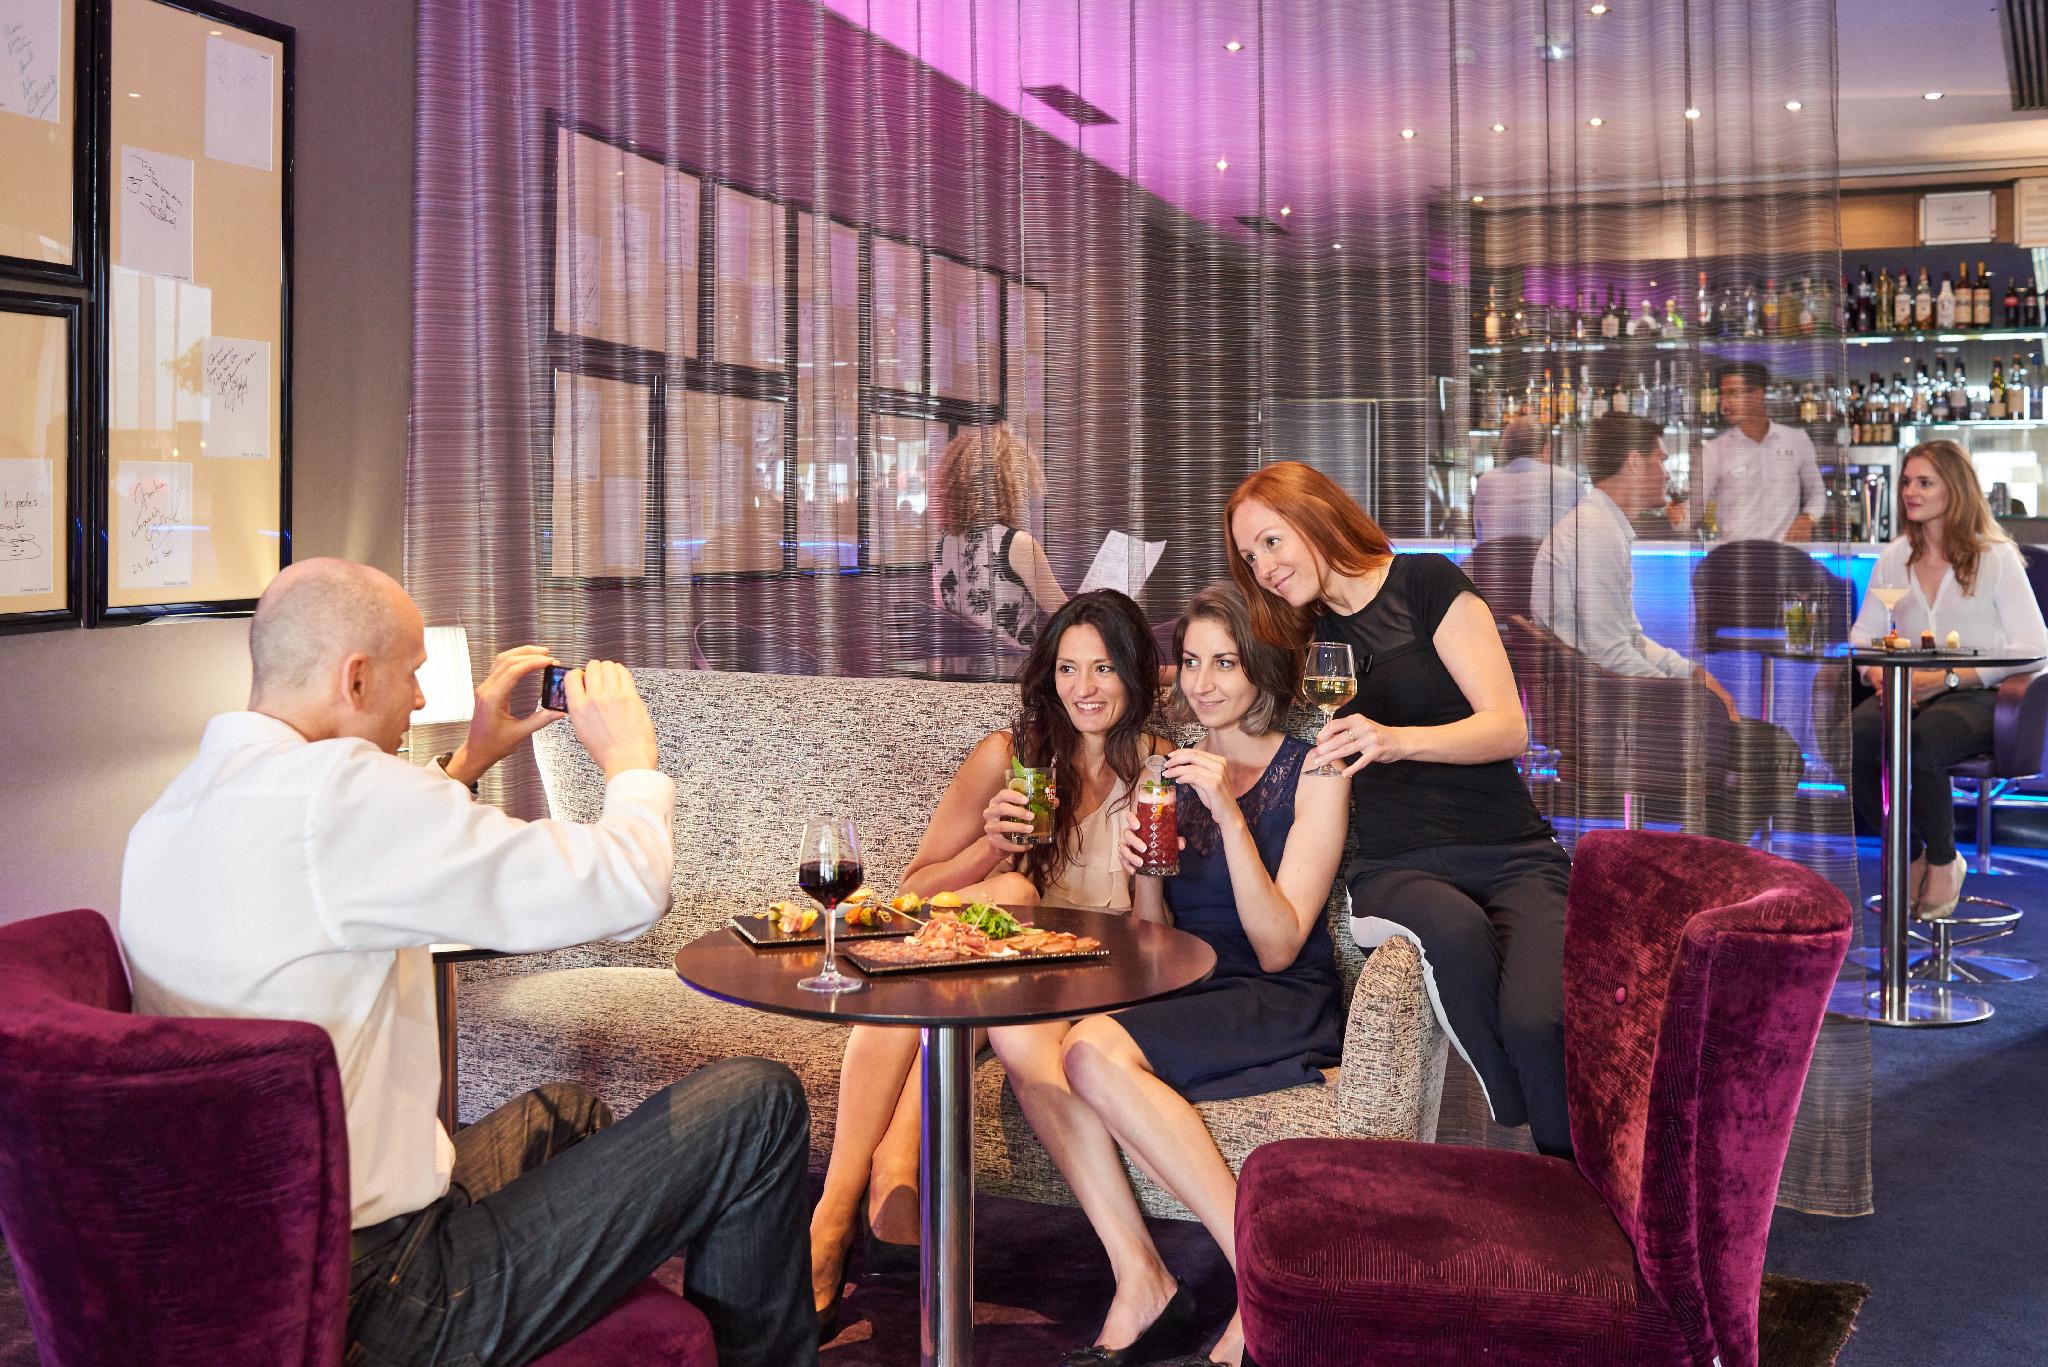 25_photographie_hotel_restaurant_nantes